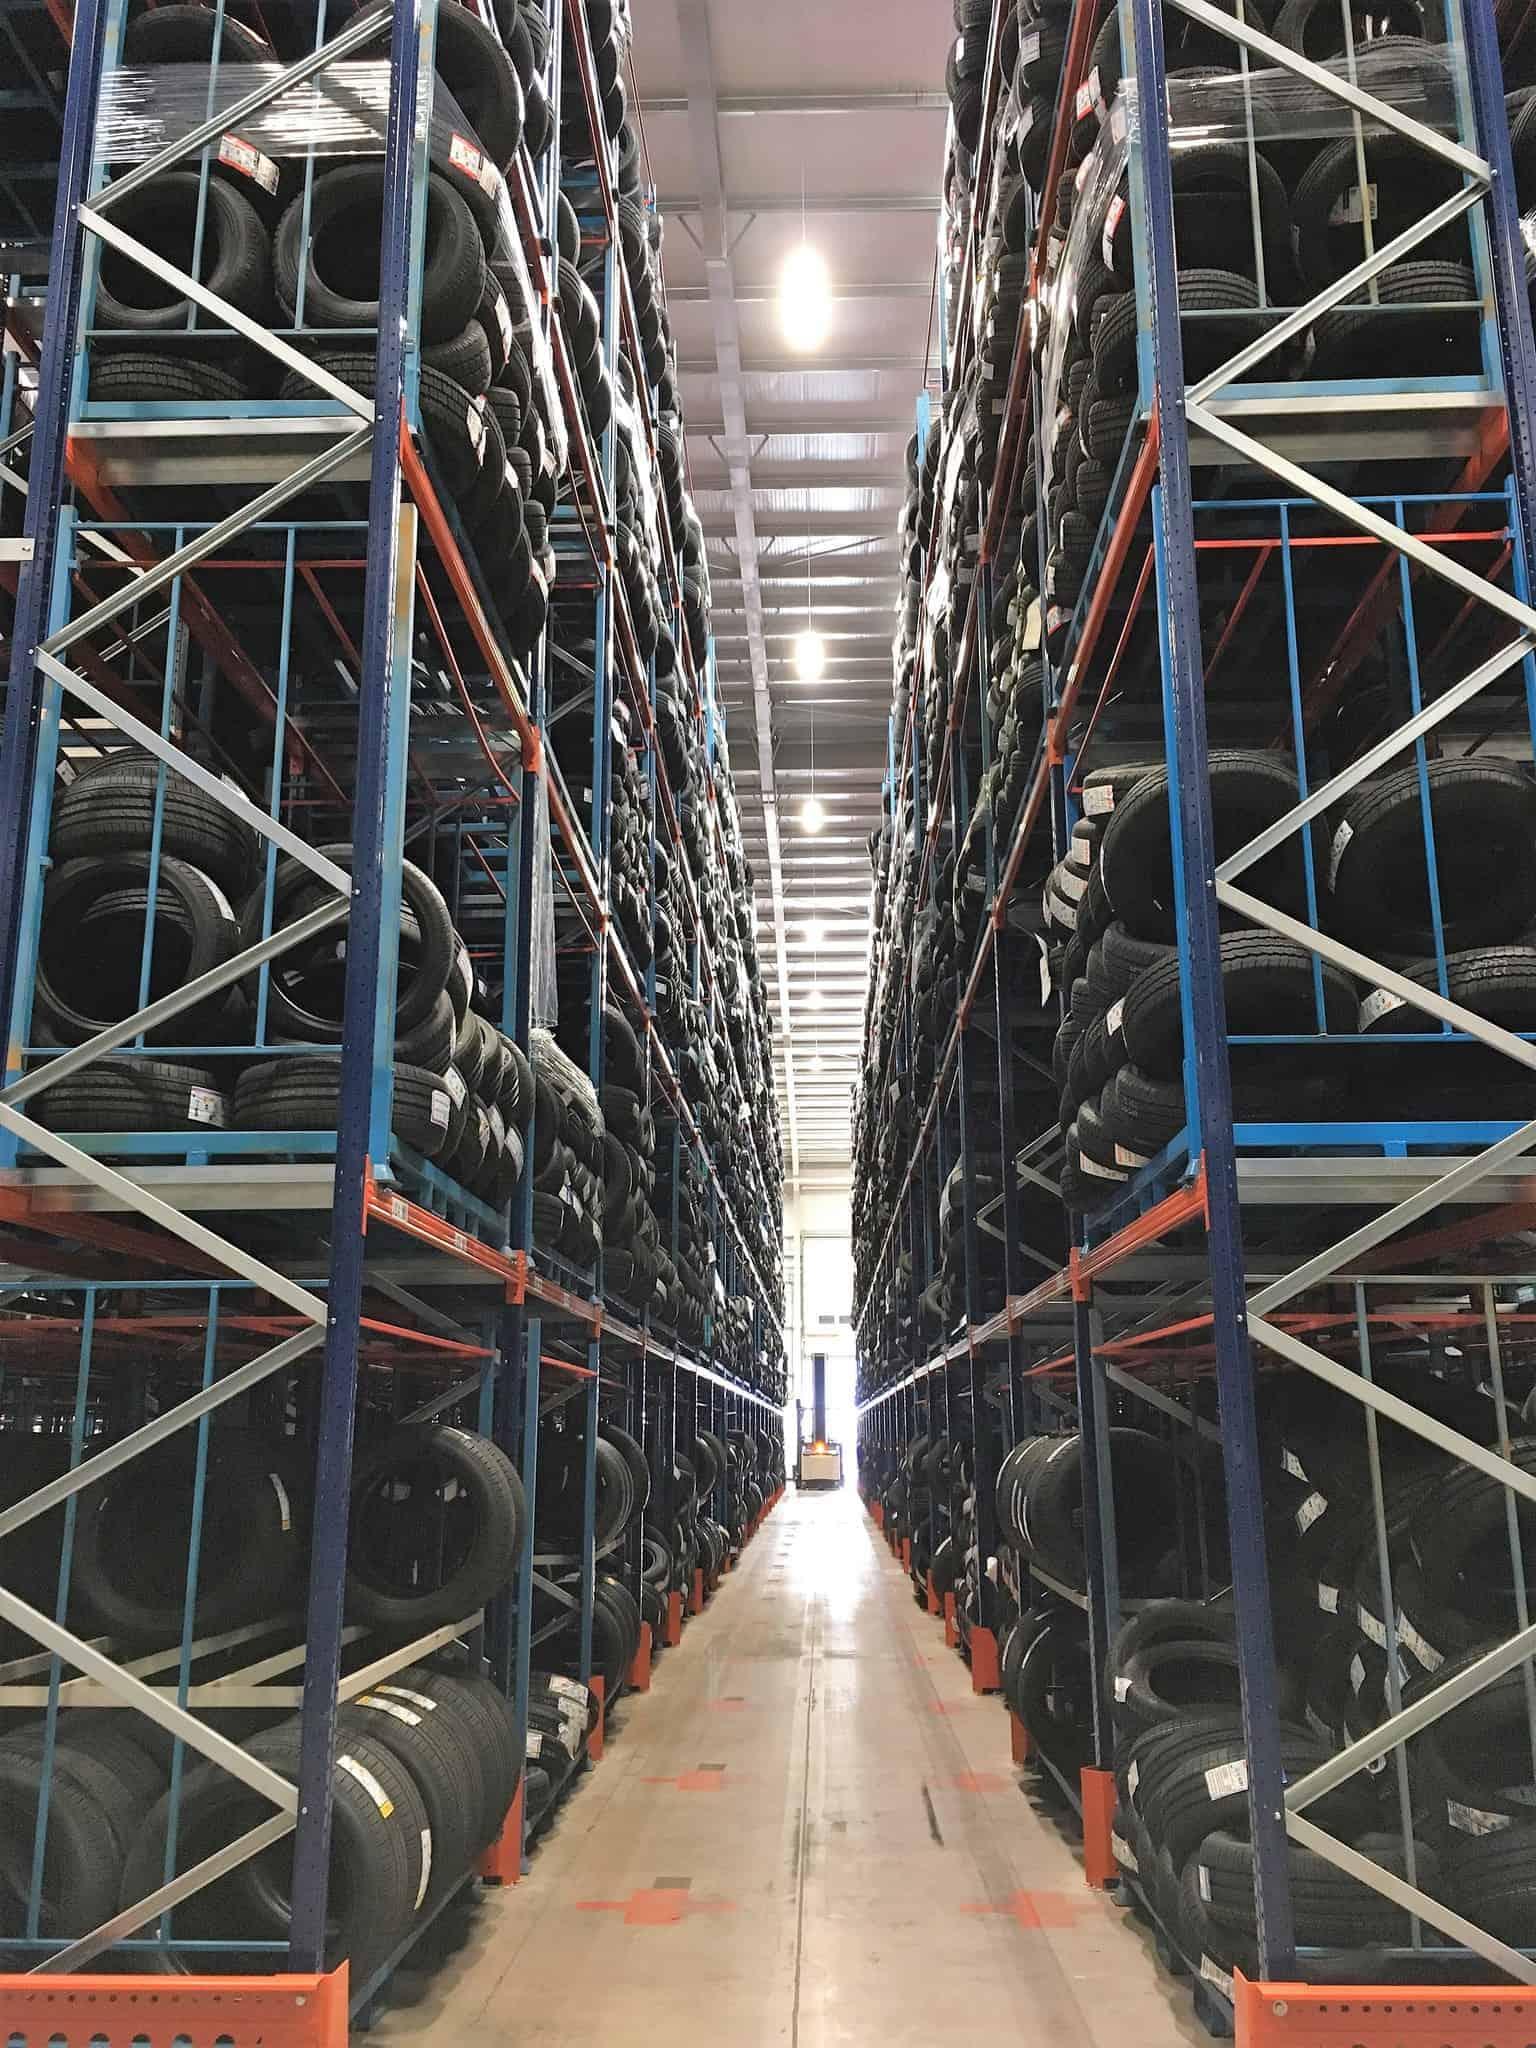 Tyre Depot Aisle